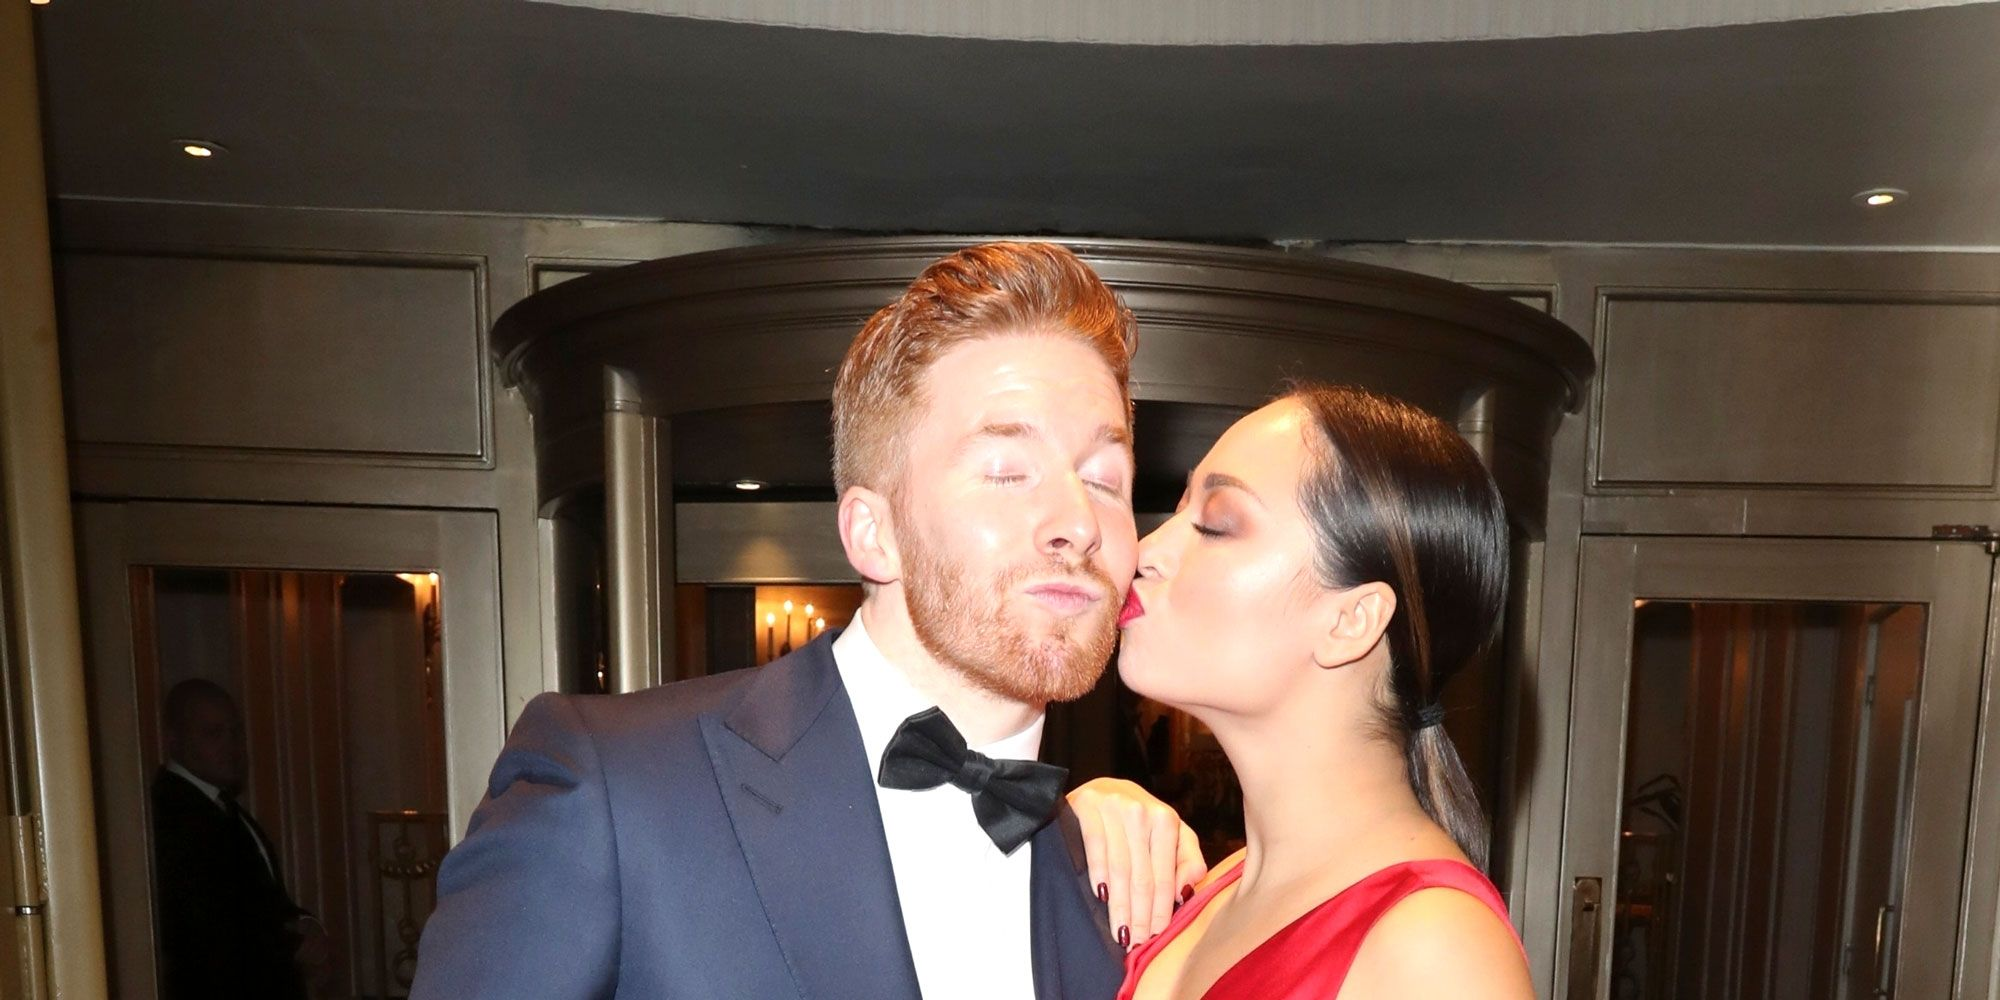 NO REUSE, Katya Jones kisses Neil Jones at Macmillan Cancer Support Winter Gala, London